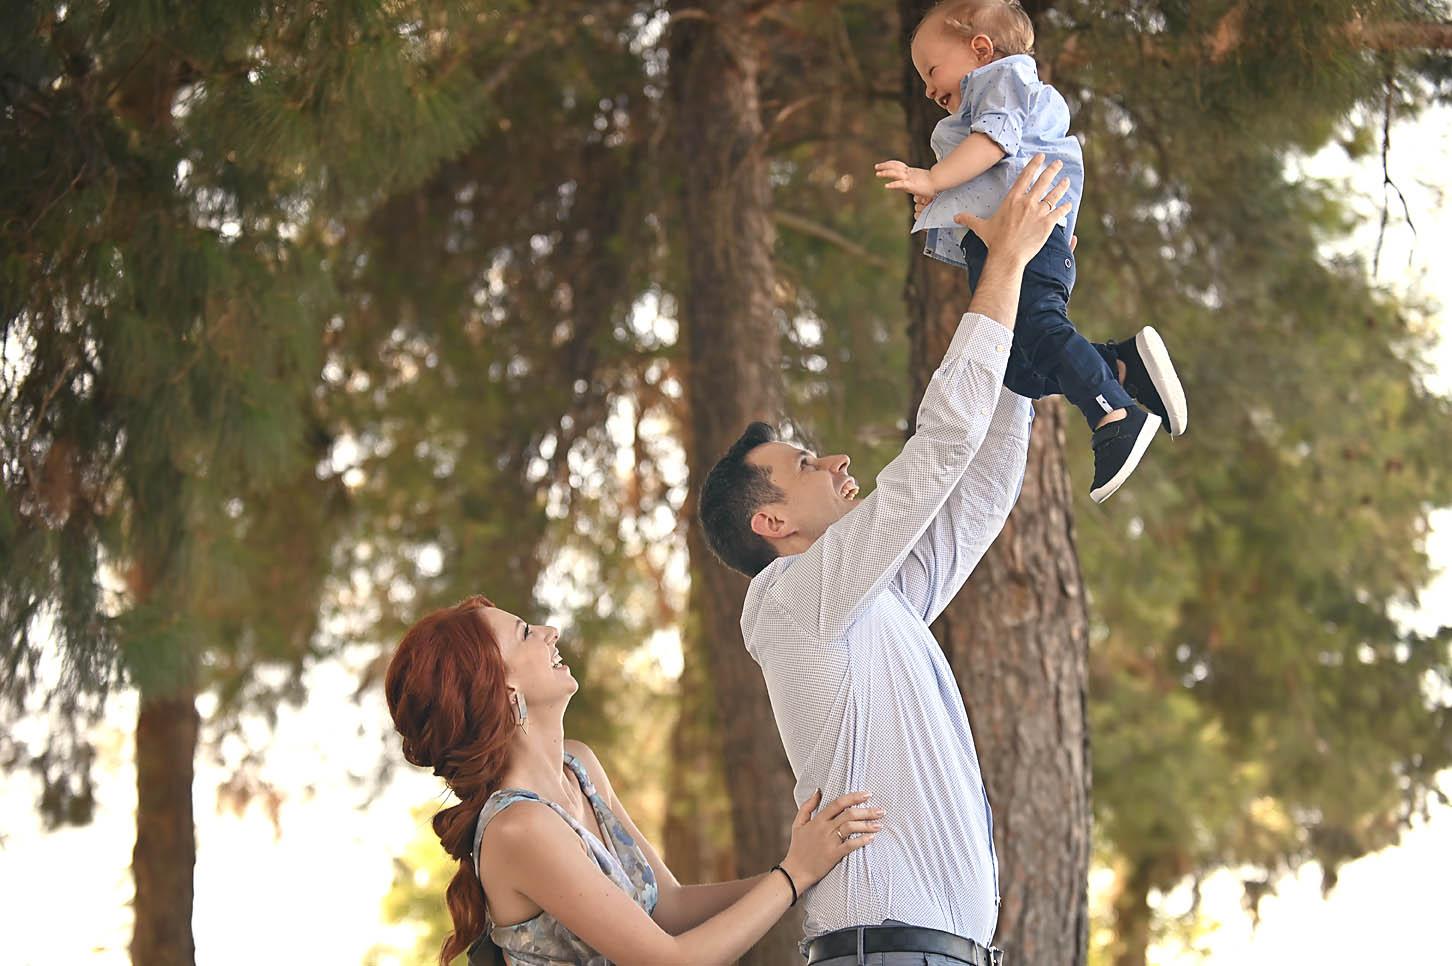 baptism- christening- family-potrtait-alexis-koumaditis-larissa